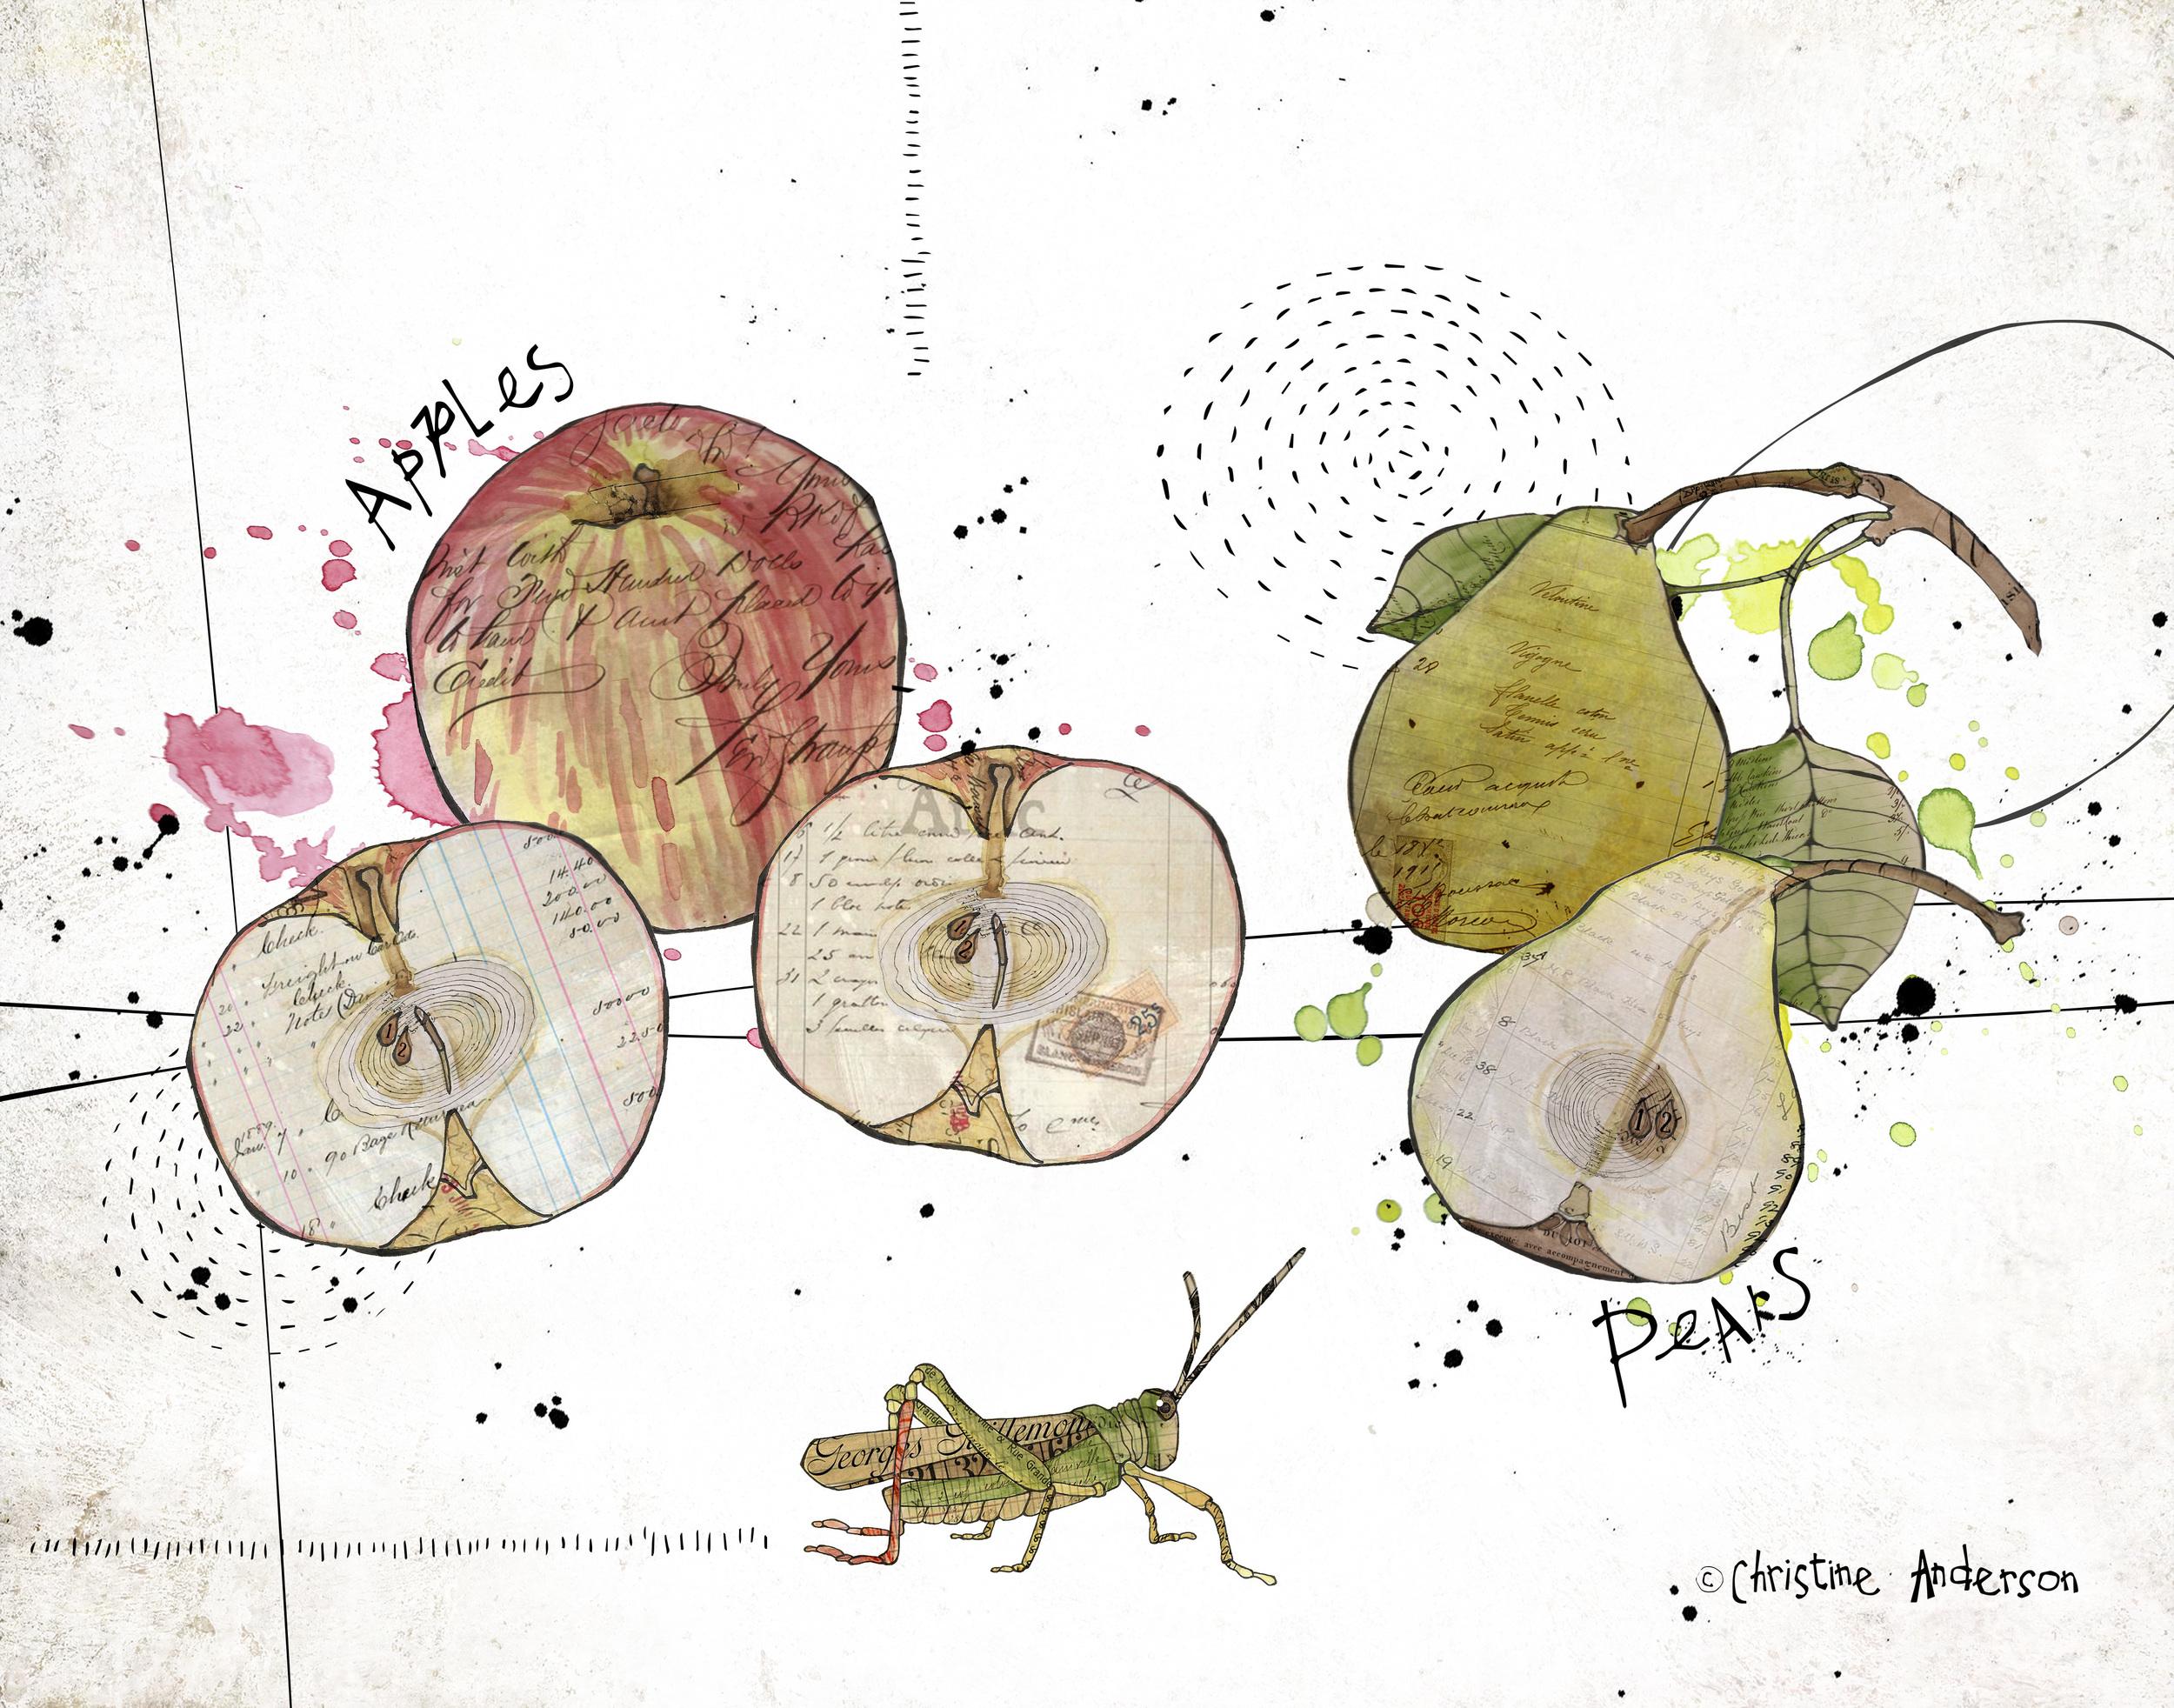 PB apples pears 11x14 for print.jpg